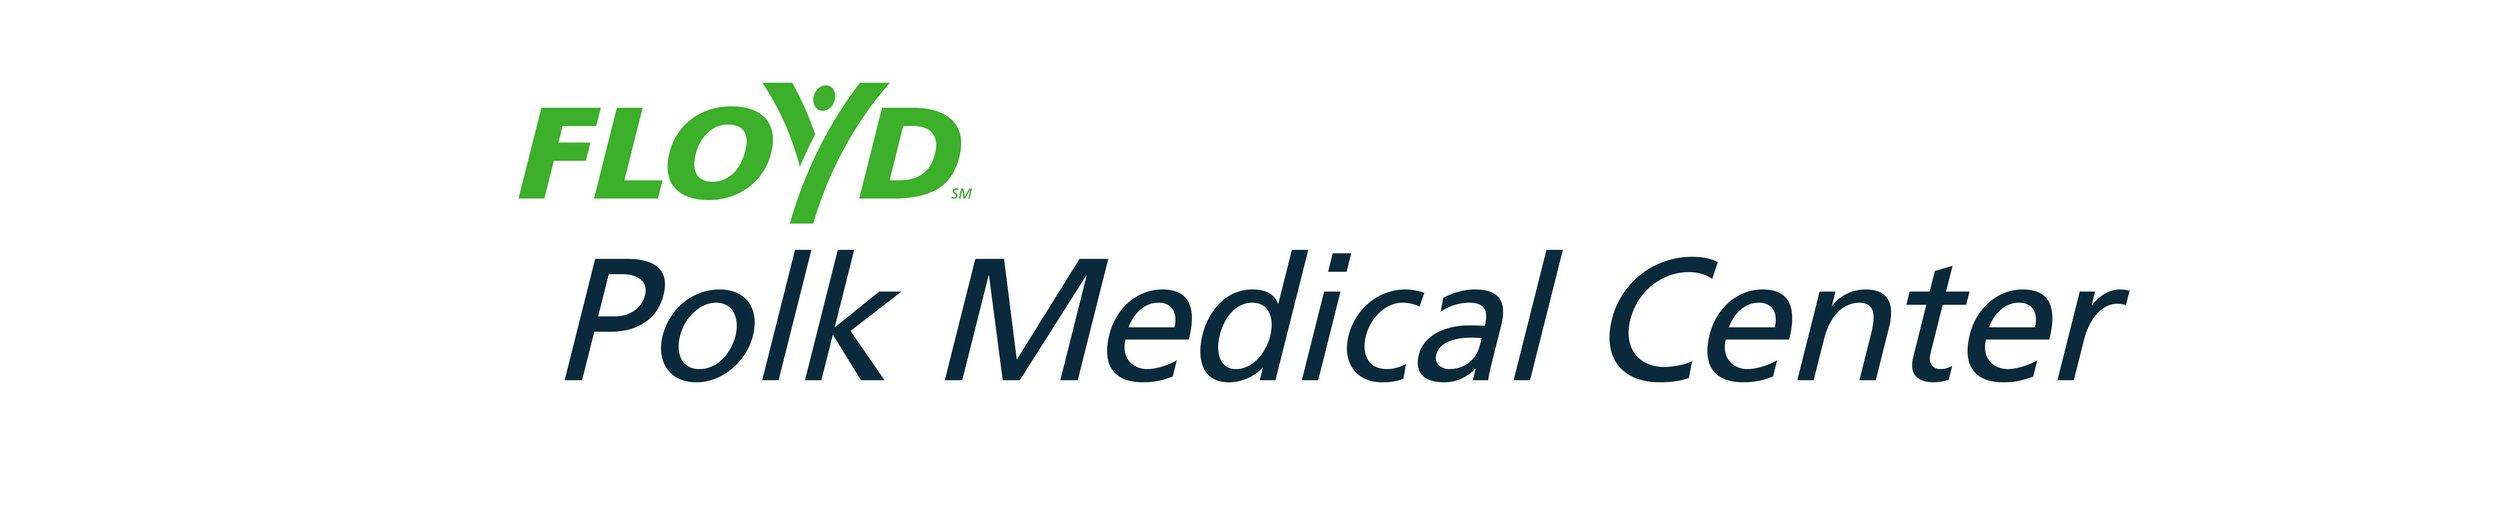 PMC-logo-2018.jpg